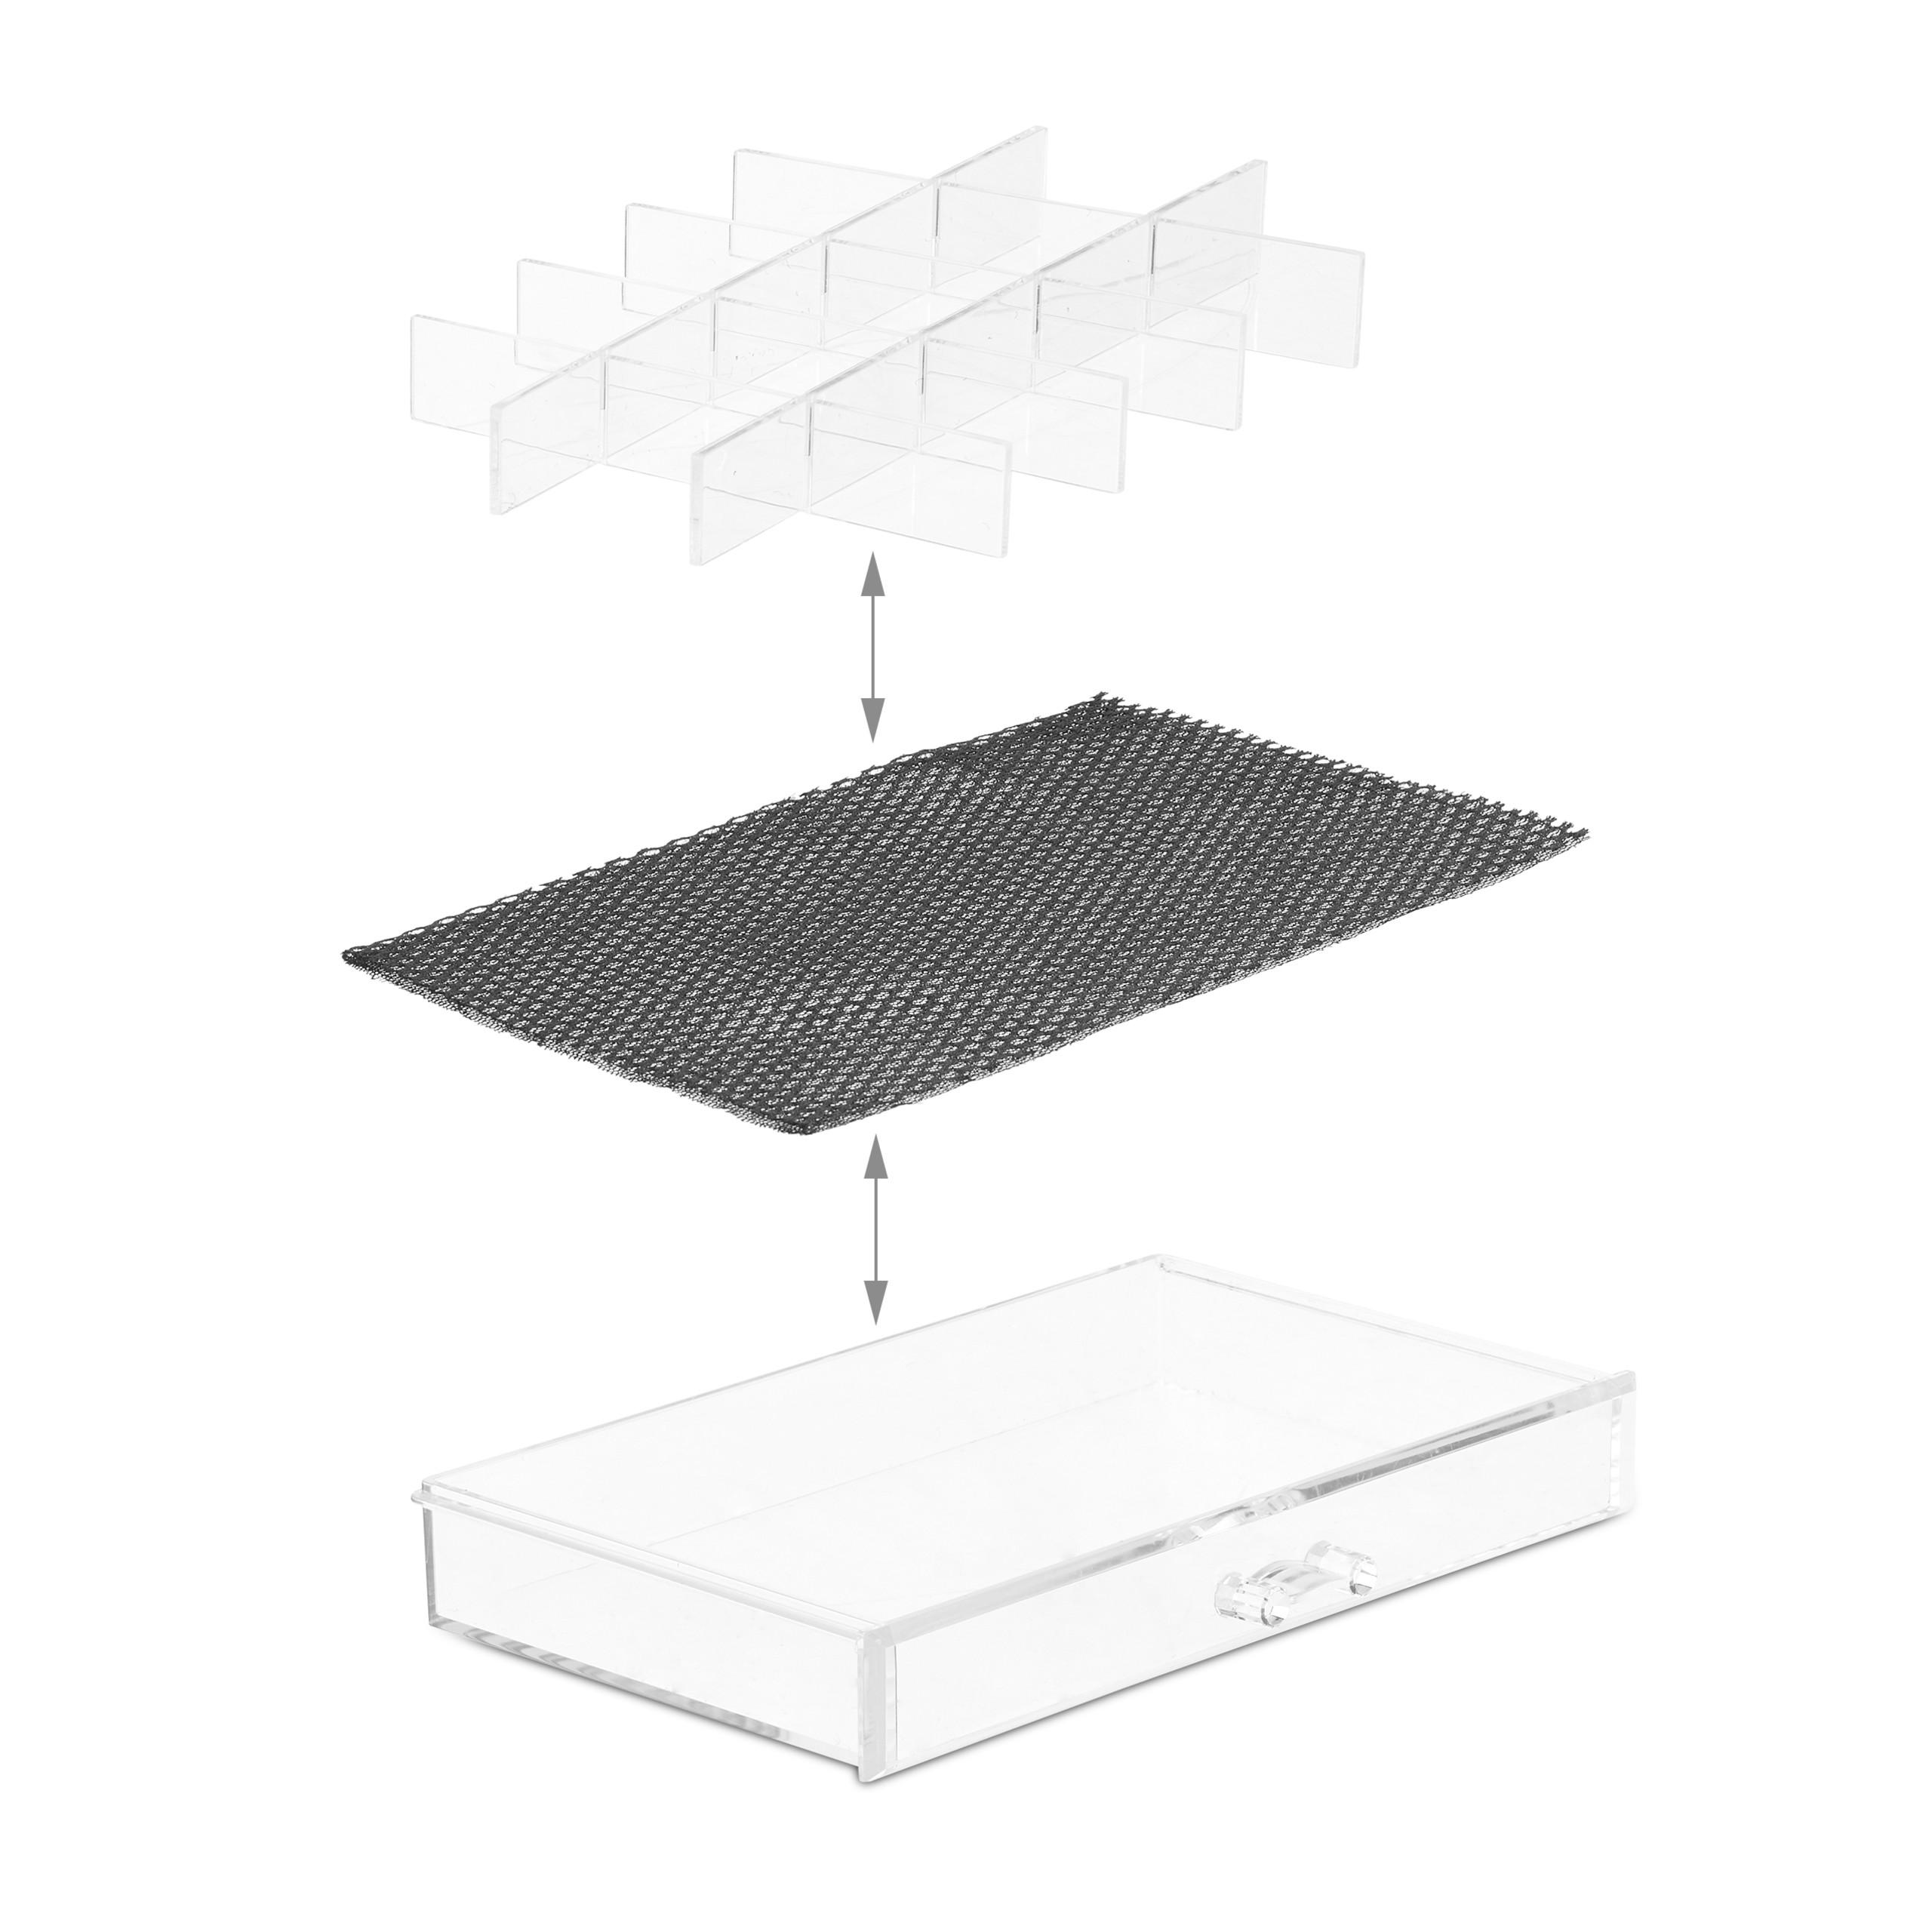 make-up-organizer-acryl-3-lades-met-vakken-acrylbox-cosmeticabox-opbergdoos miniatuur 8